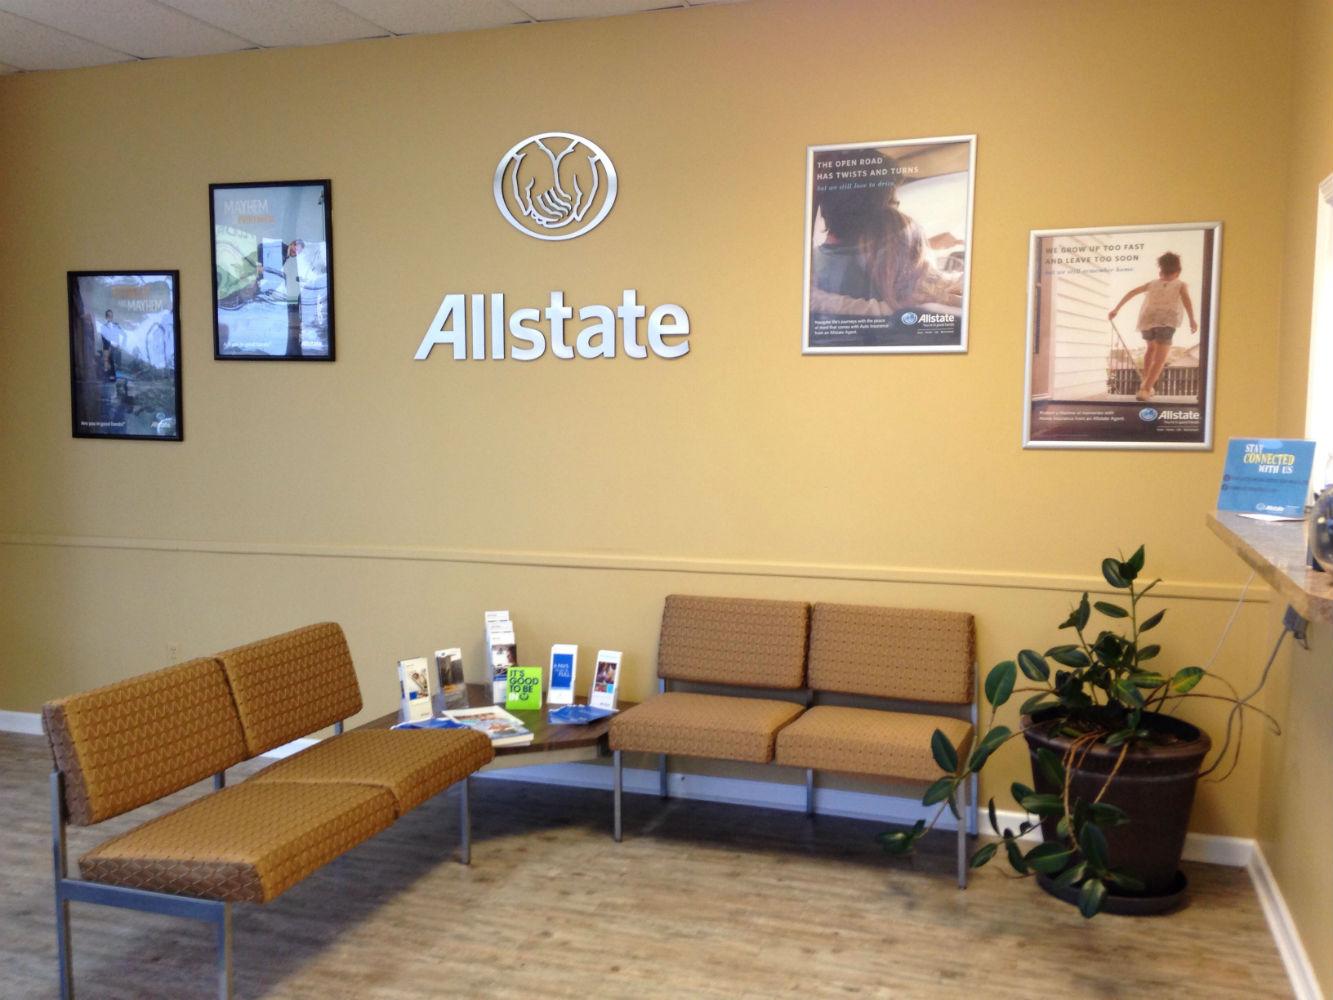 Ann Arcement: Allstate Insurance image 5